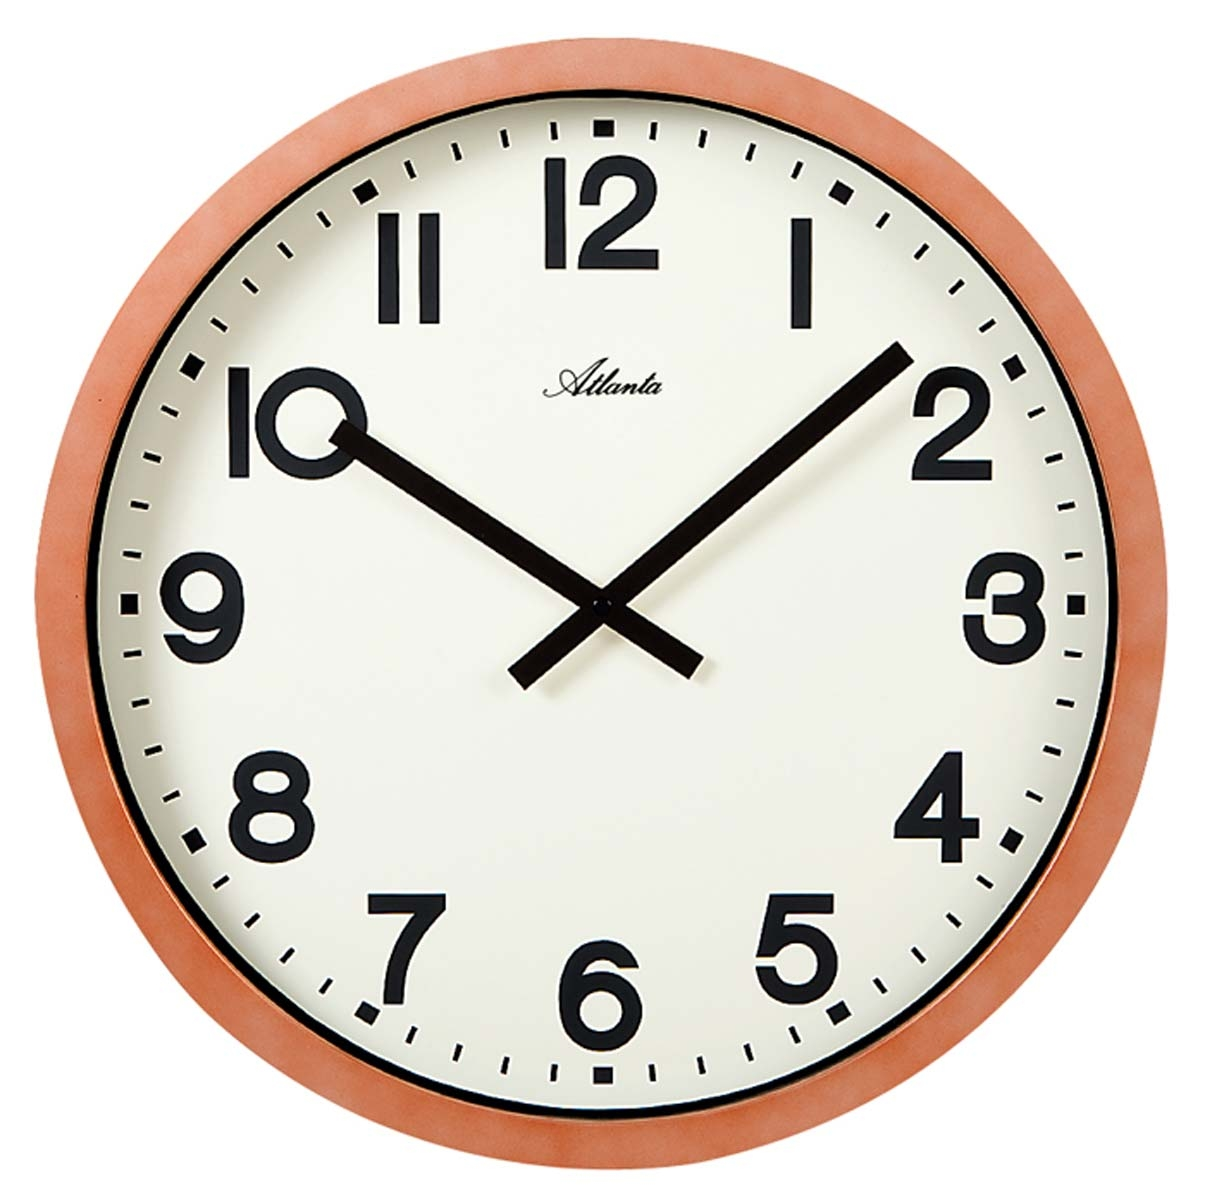 montres chrono12 atlanta 4437 wanduhr modern. Black Bedroom Furniture Sets. Home Design Ideas